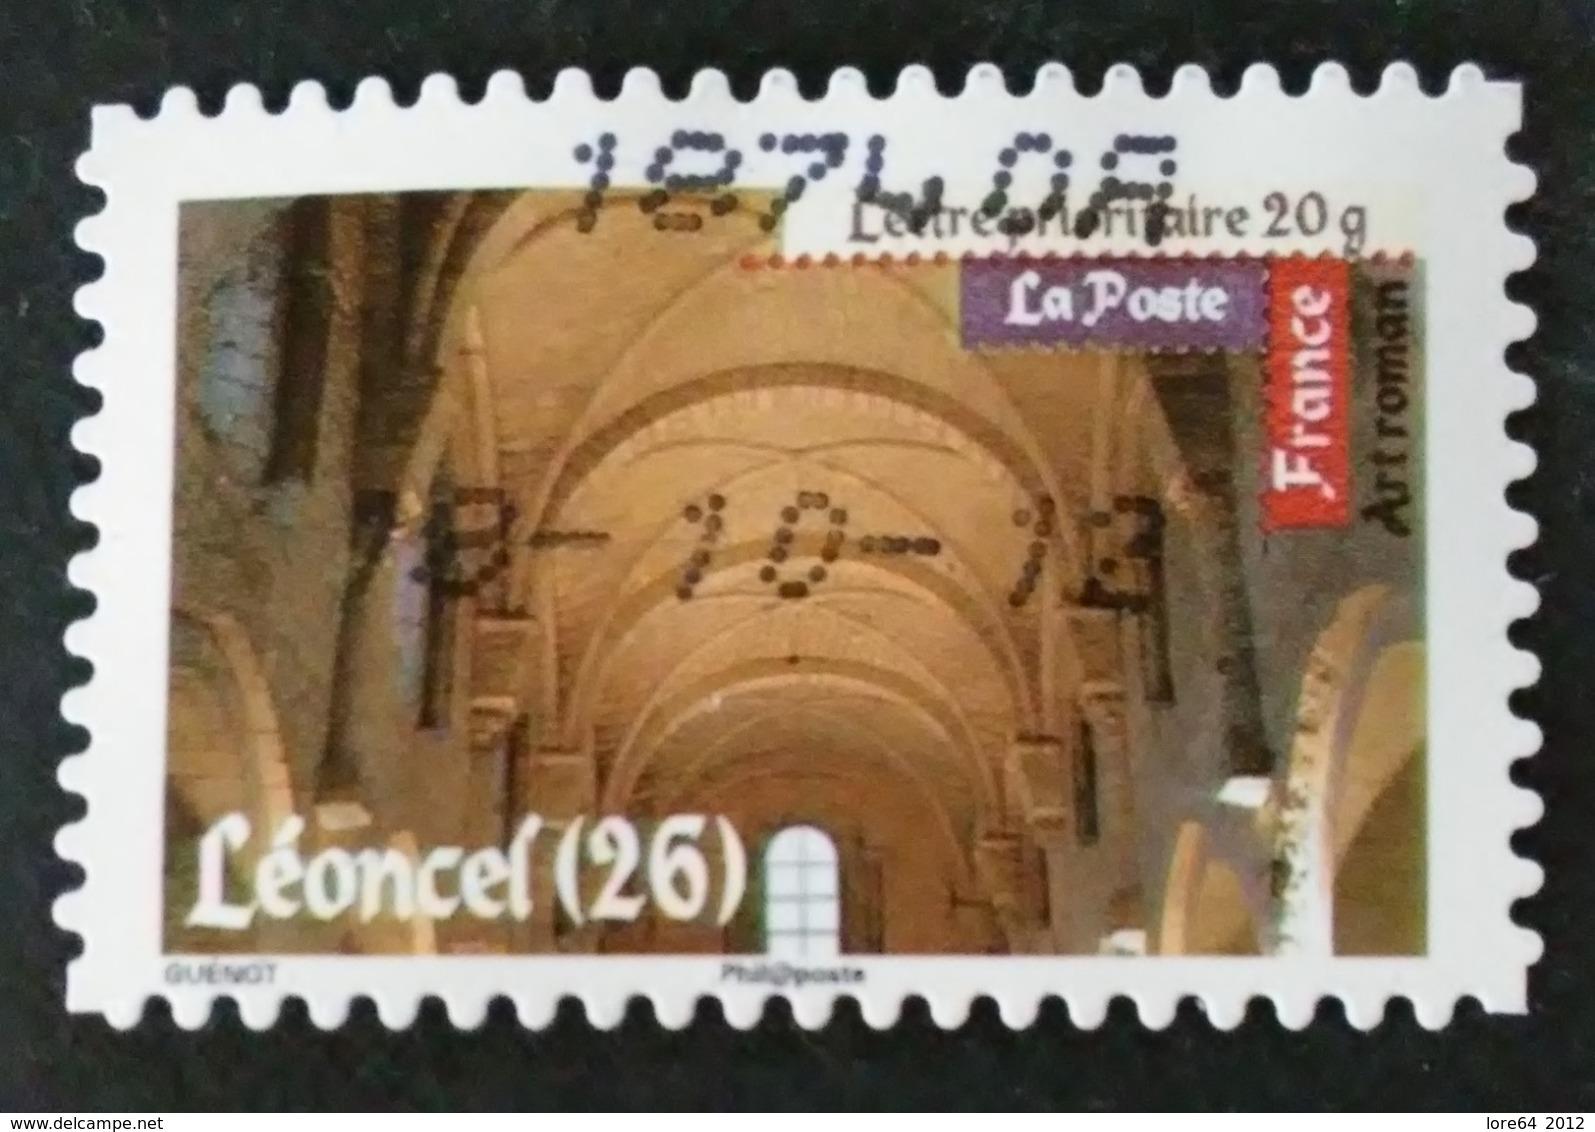 FRANCIA 2010 - 456 - Adhésifs (autocollants)